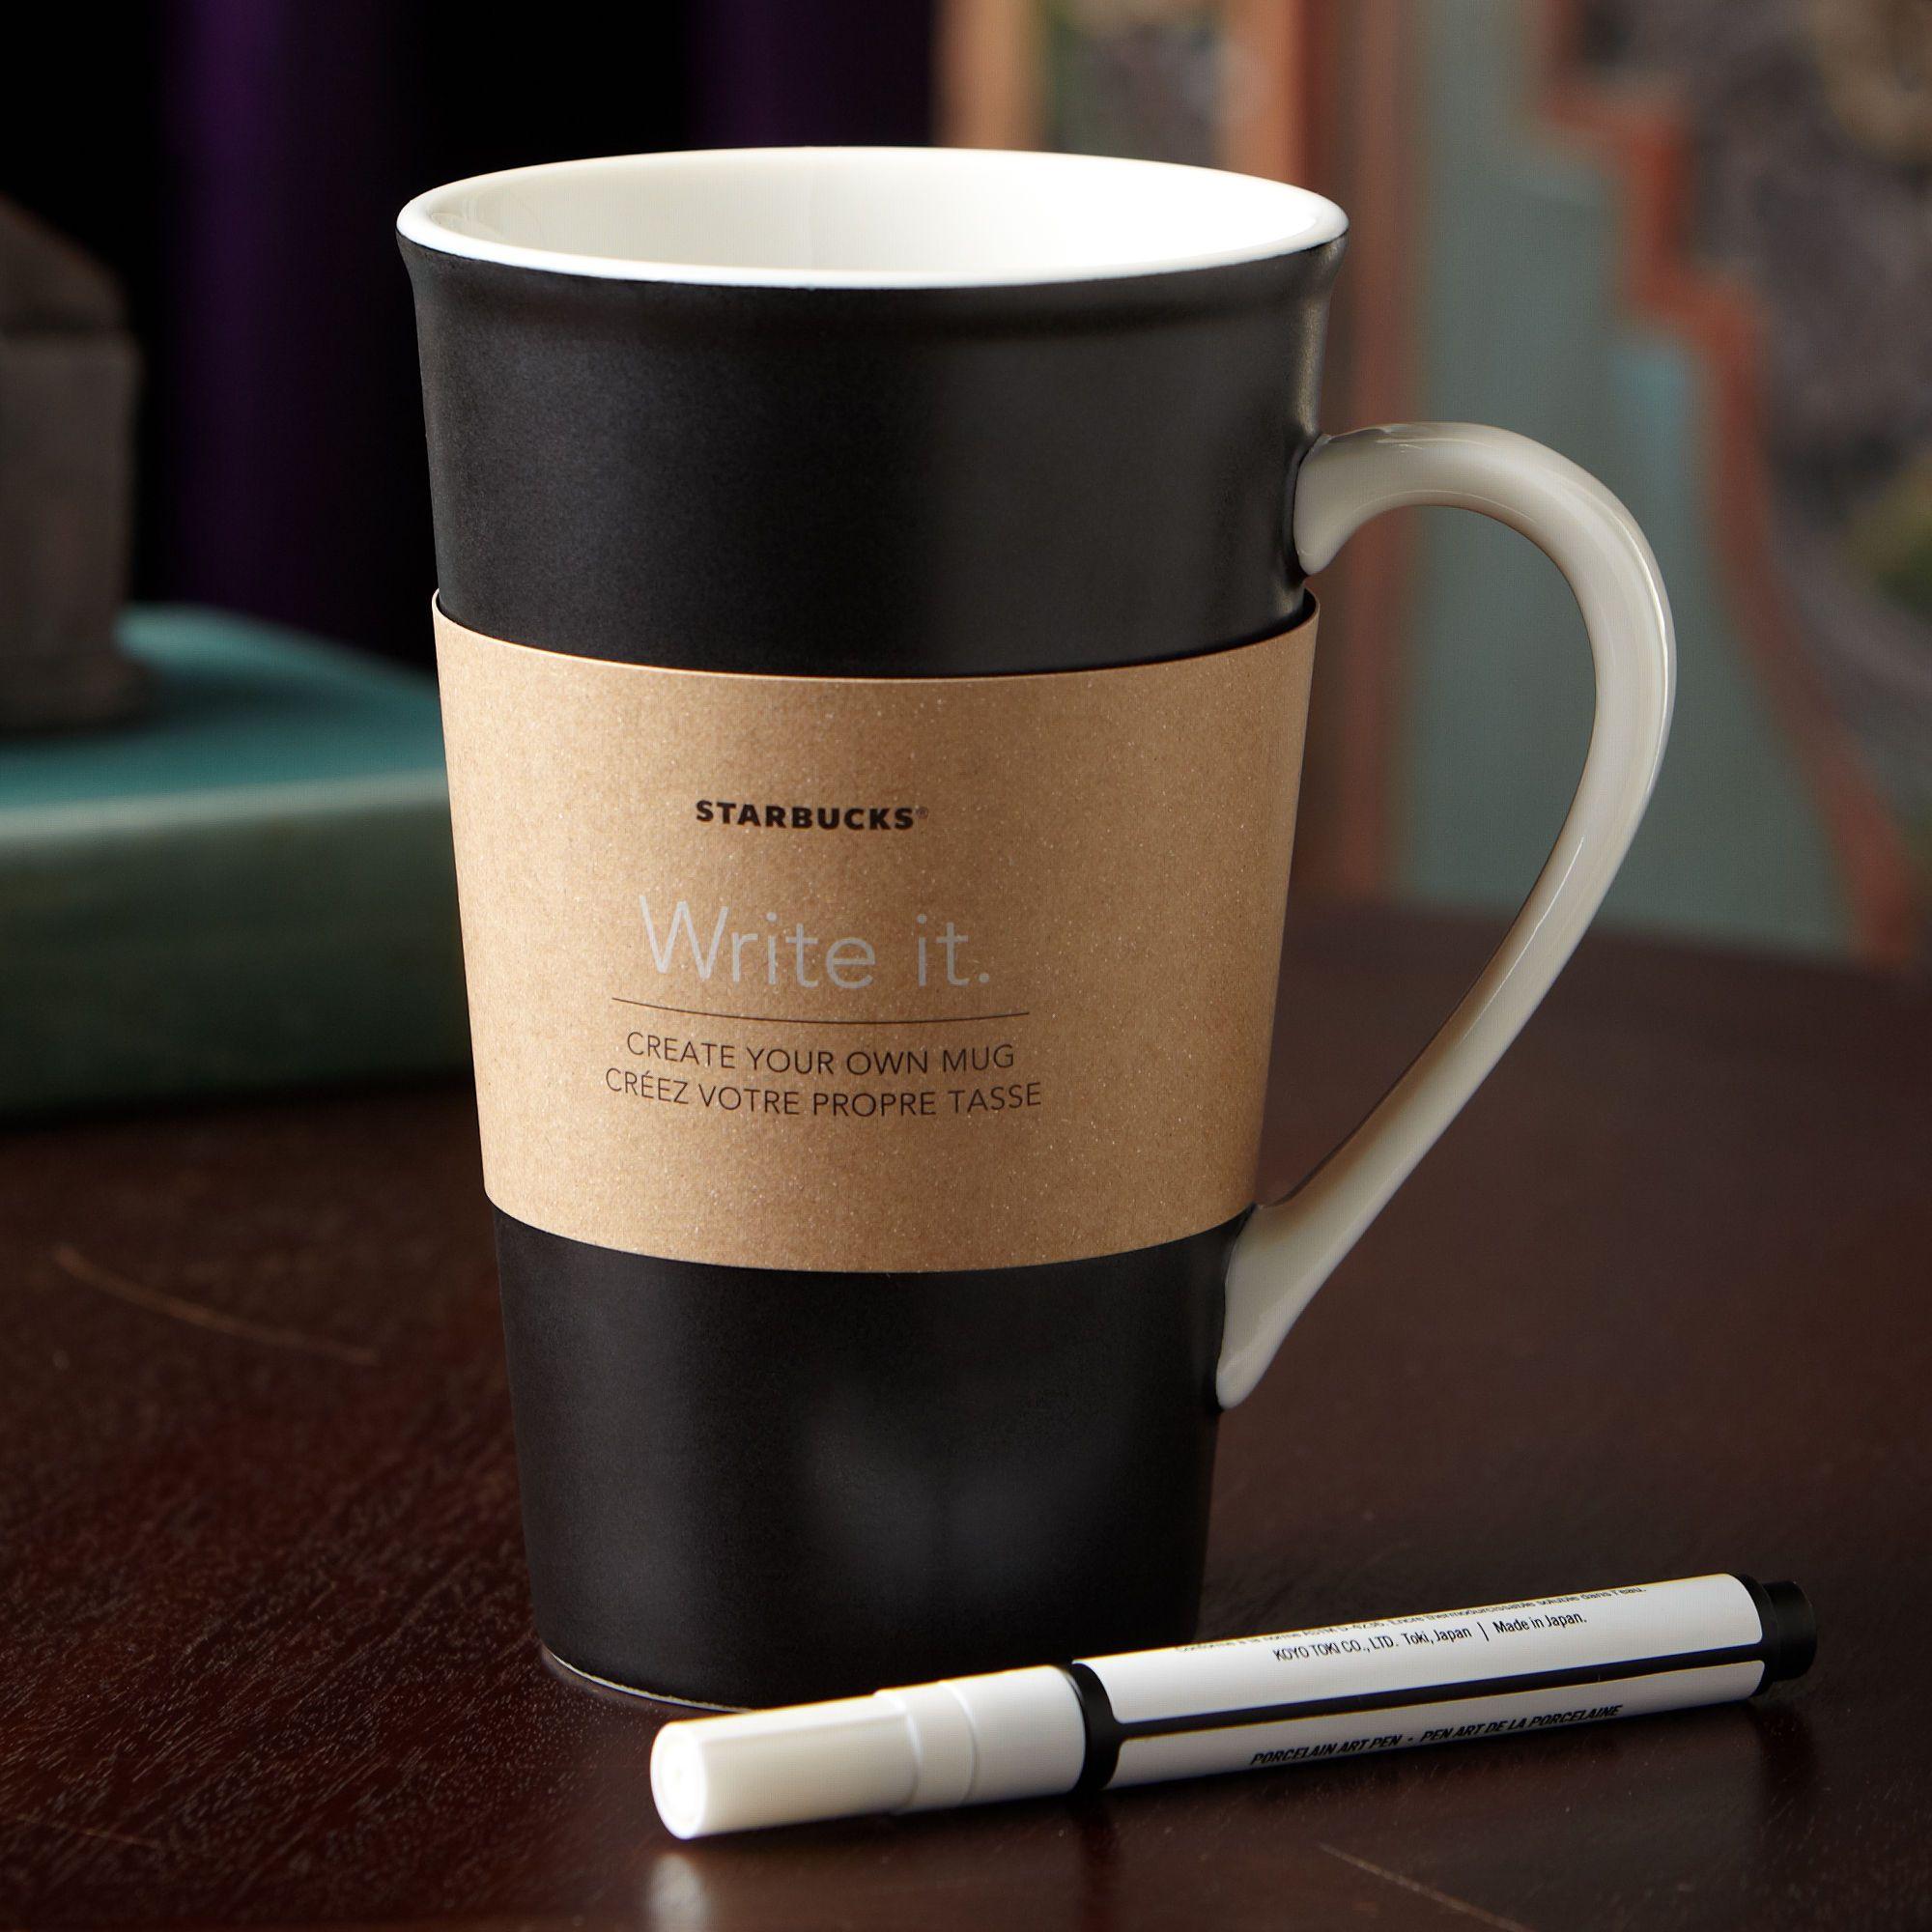 Starbucks Create Your Own Mug 16 Fl Oz With Glazing Pen A